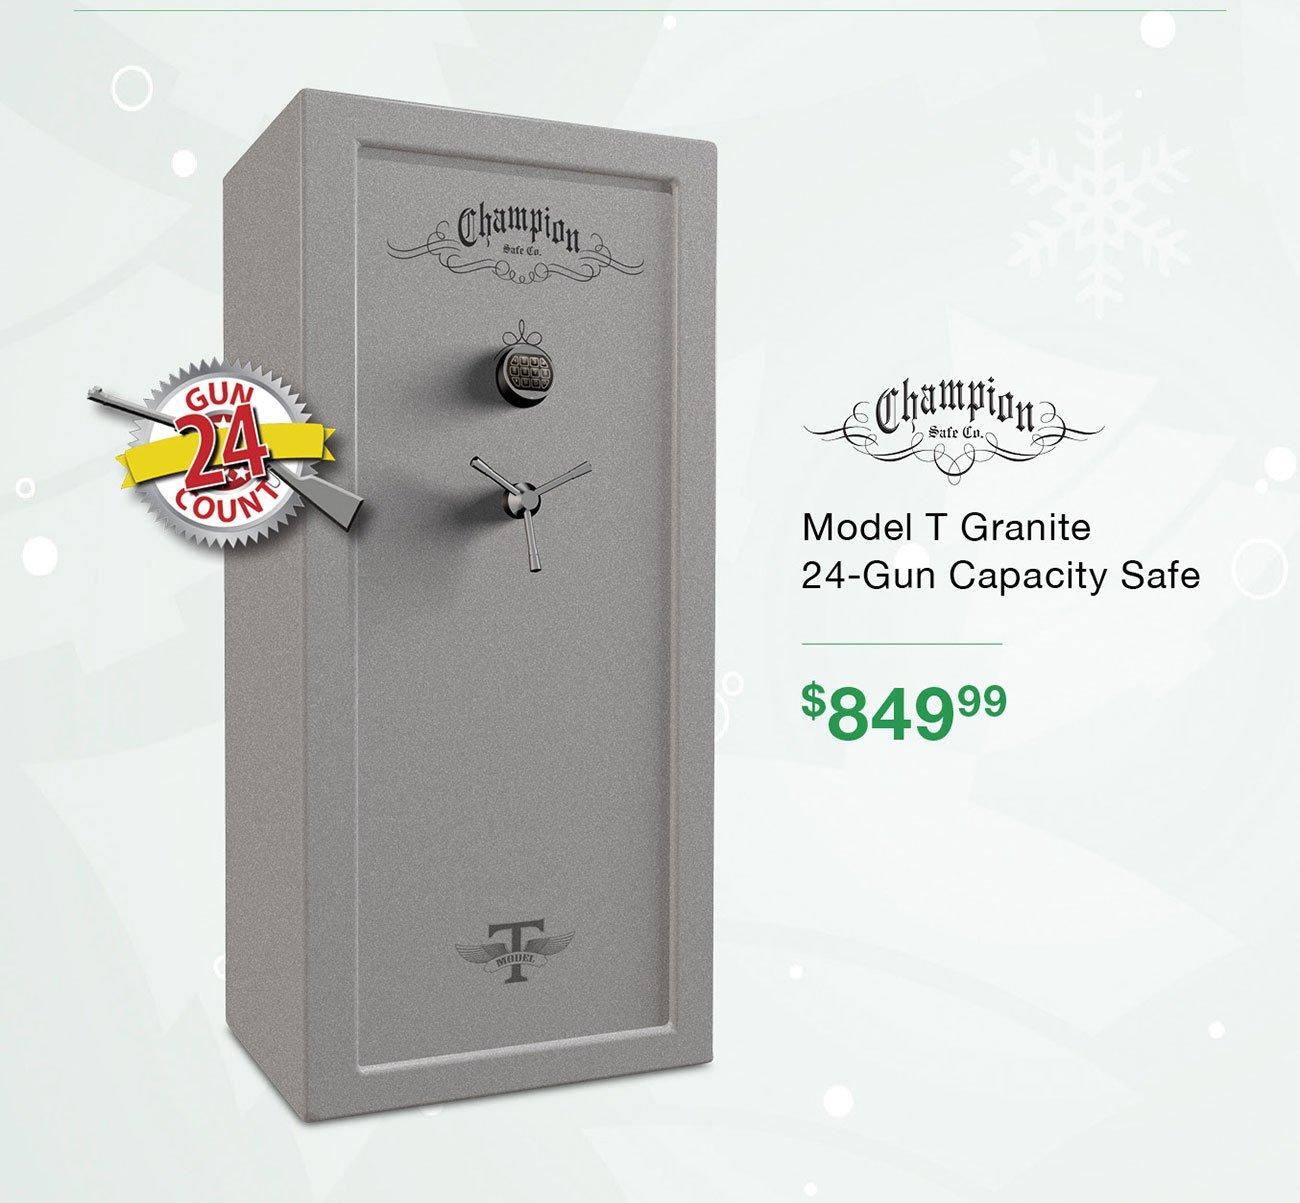 Champion-24-gun-safe